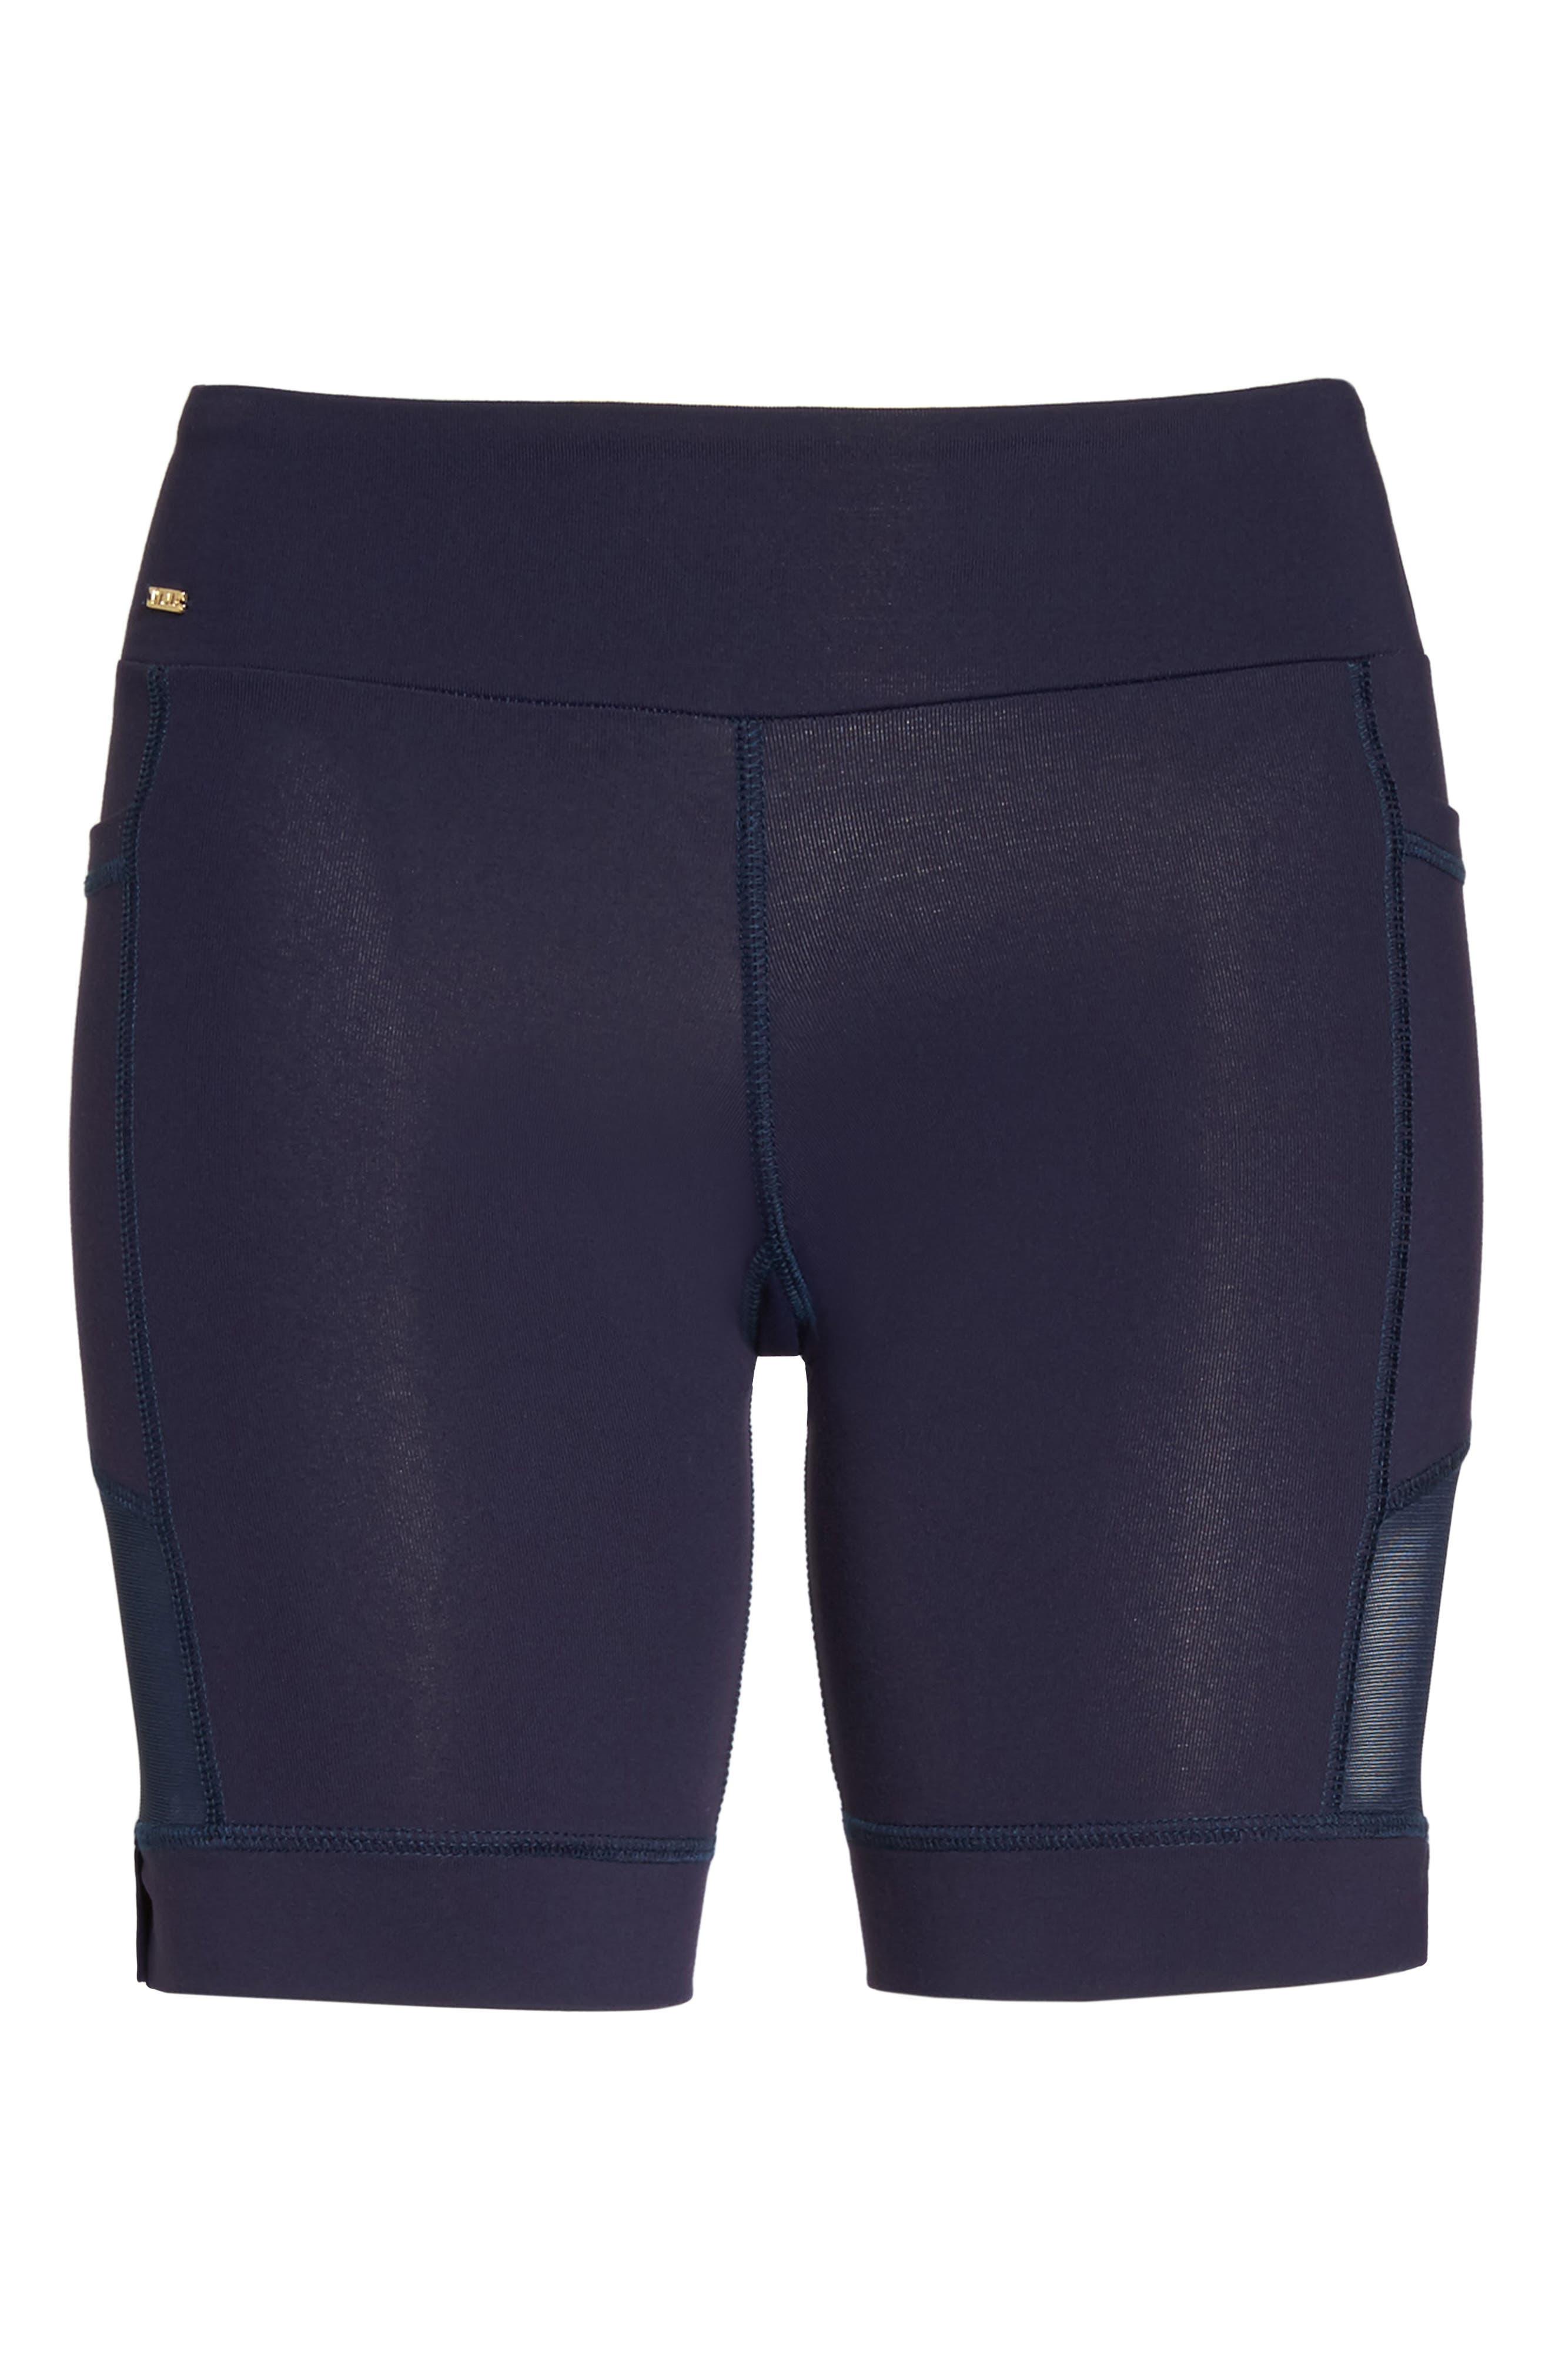 Nicole Active Shorts,                             Alternate thumbnail 4, color,                             Navy Mesh